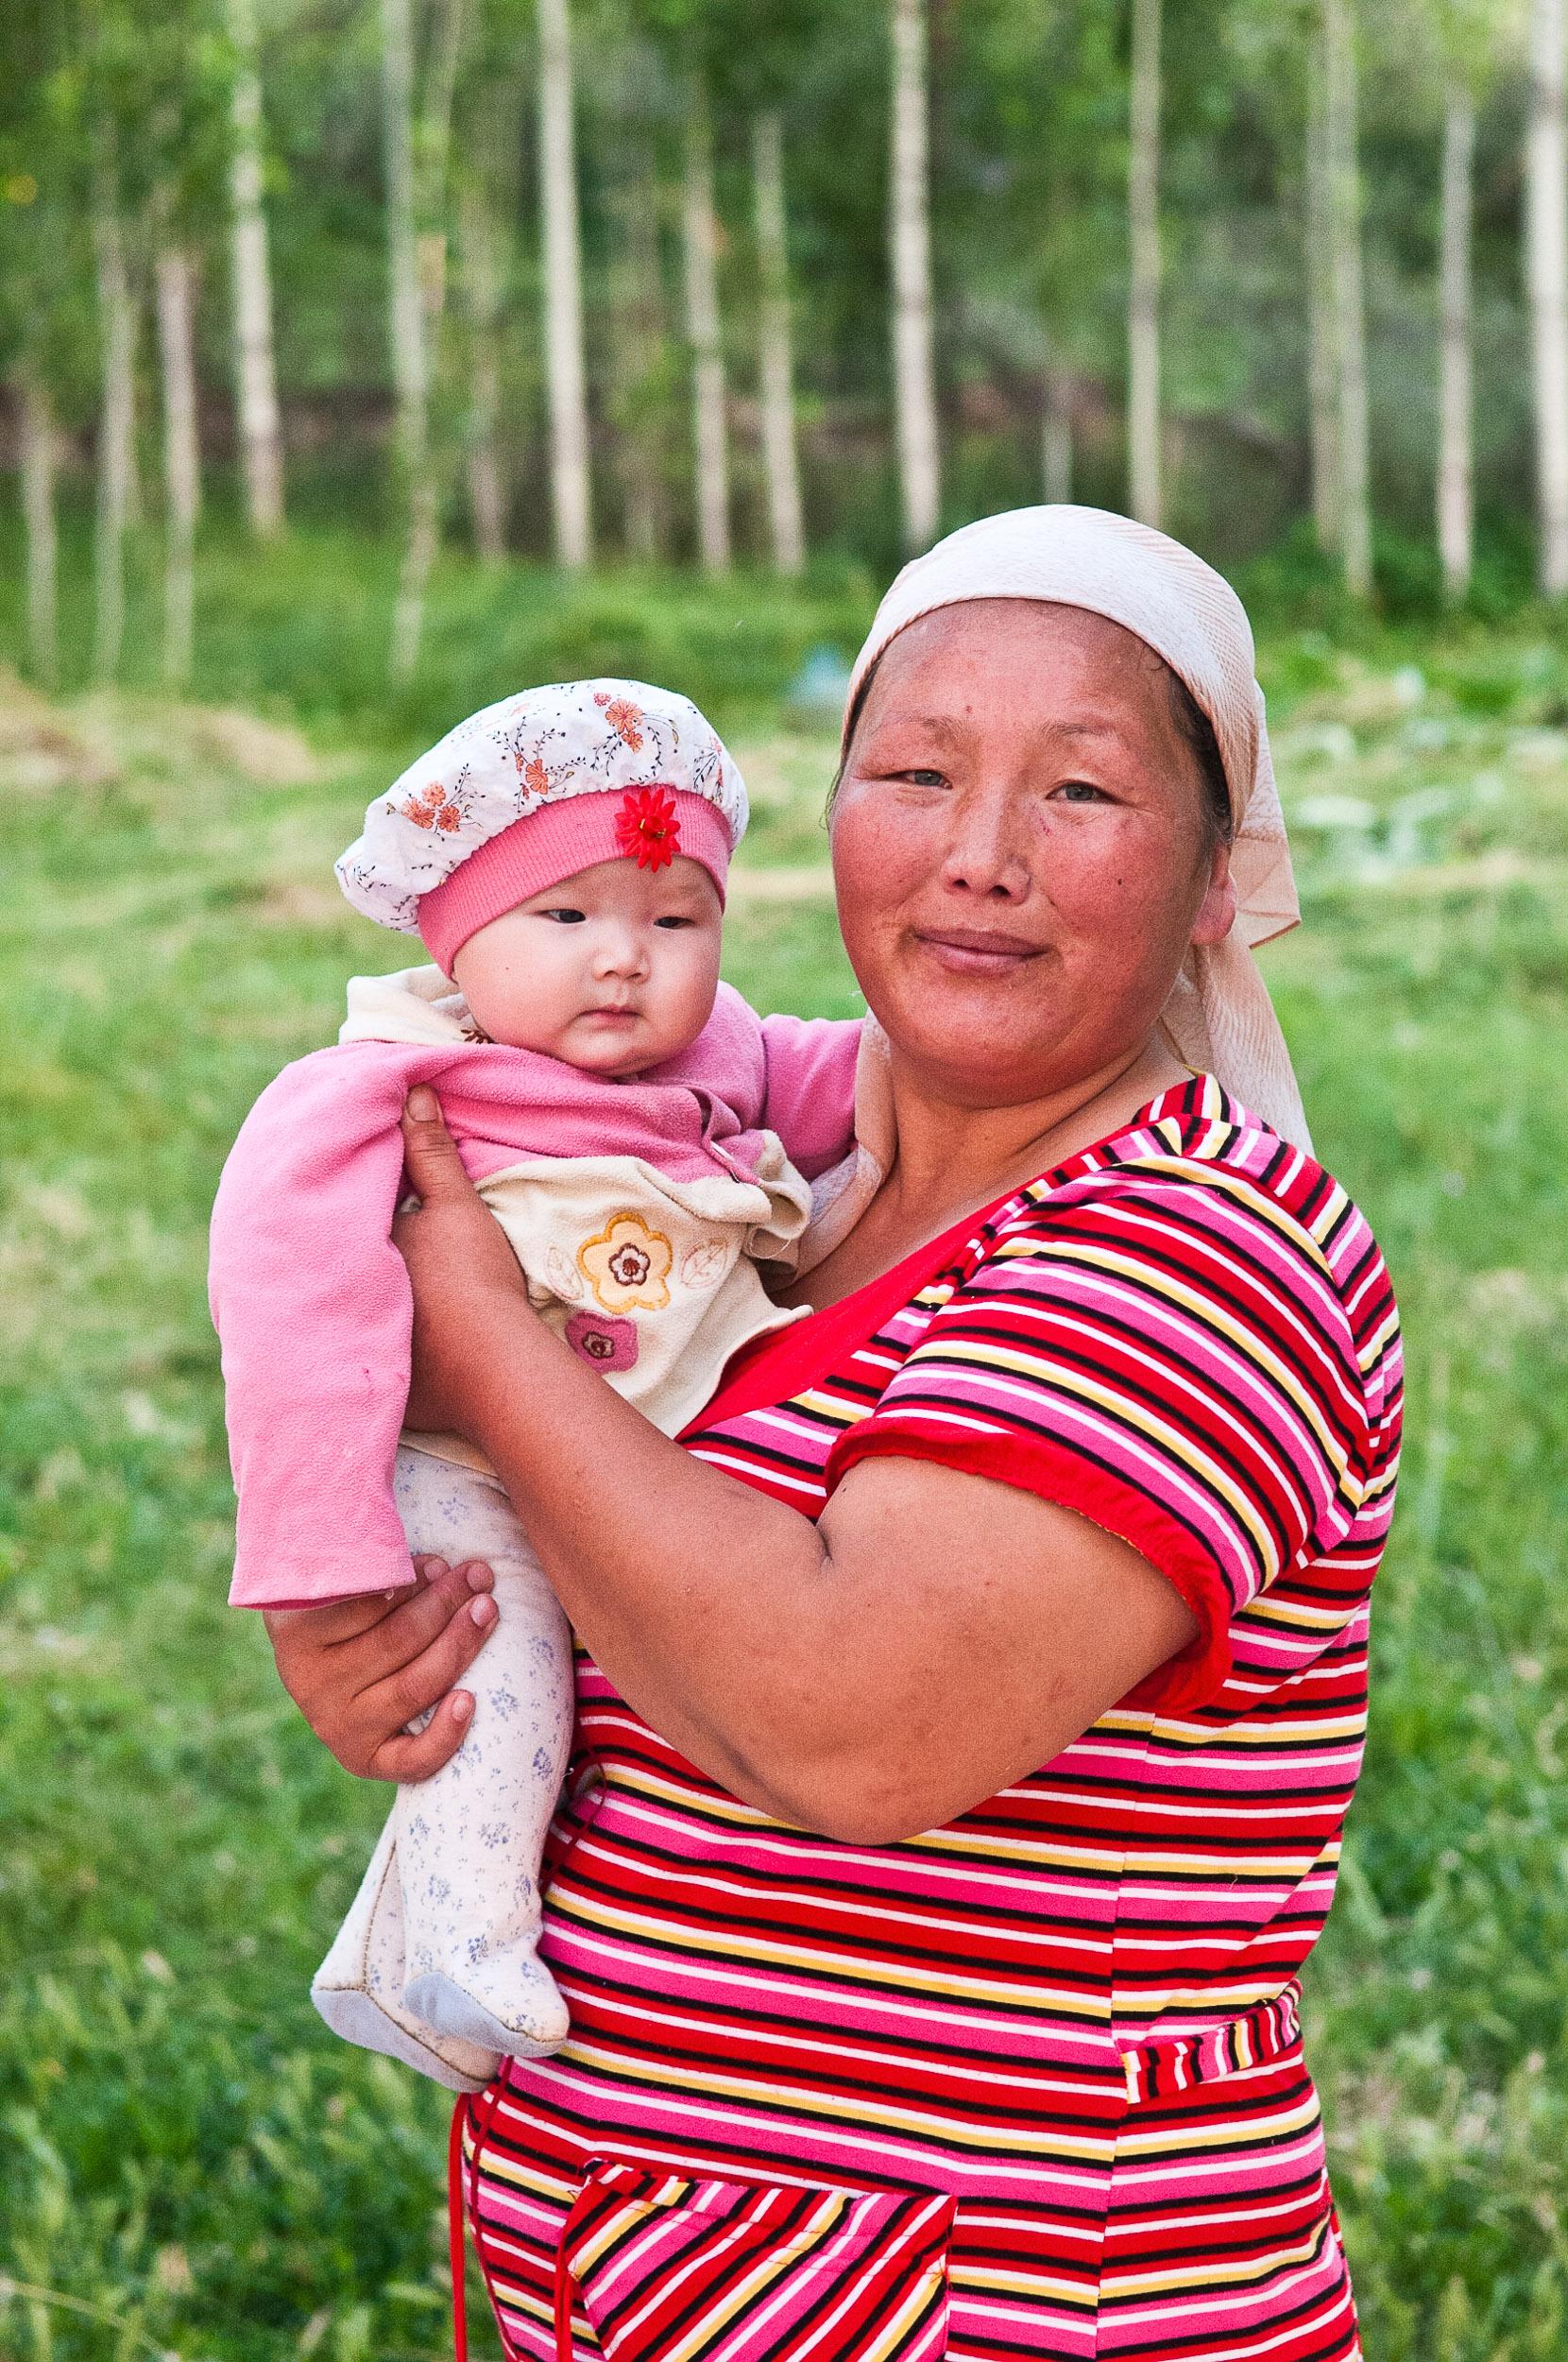 Mother and child portrait, Kazakhstan.